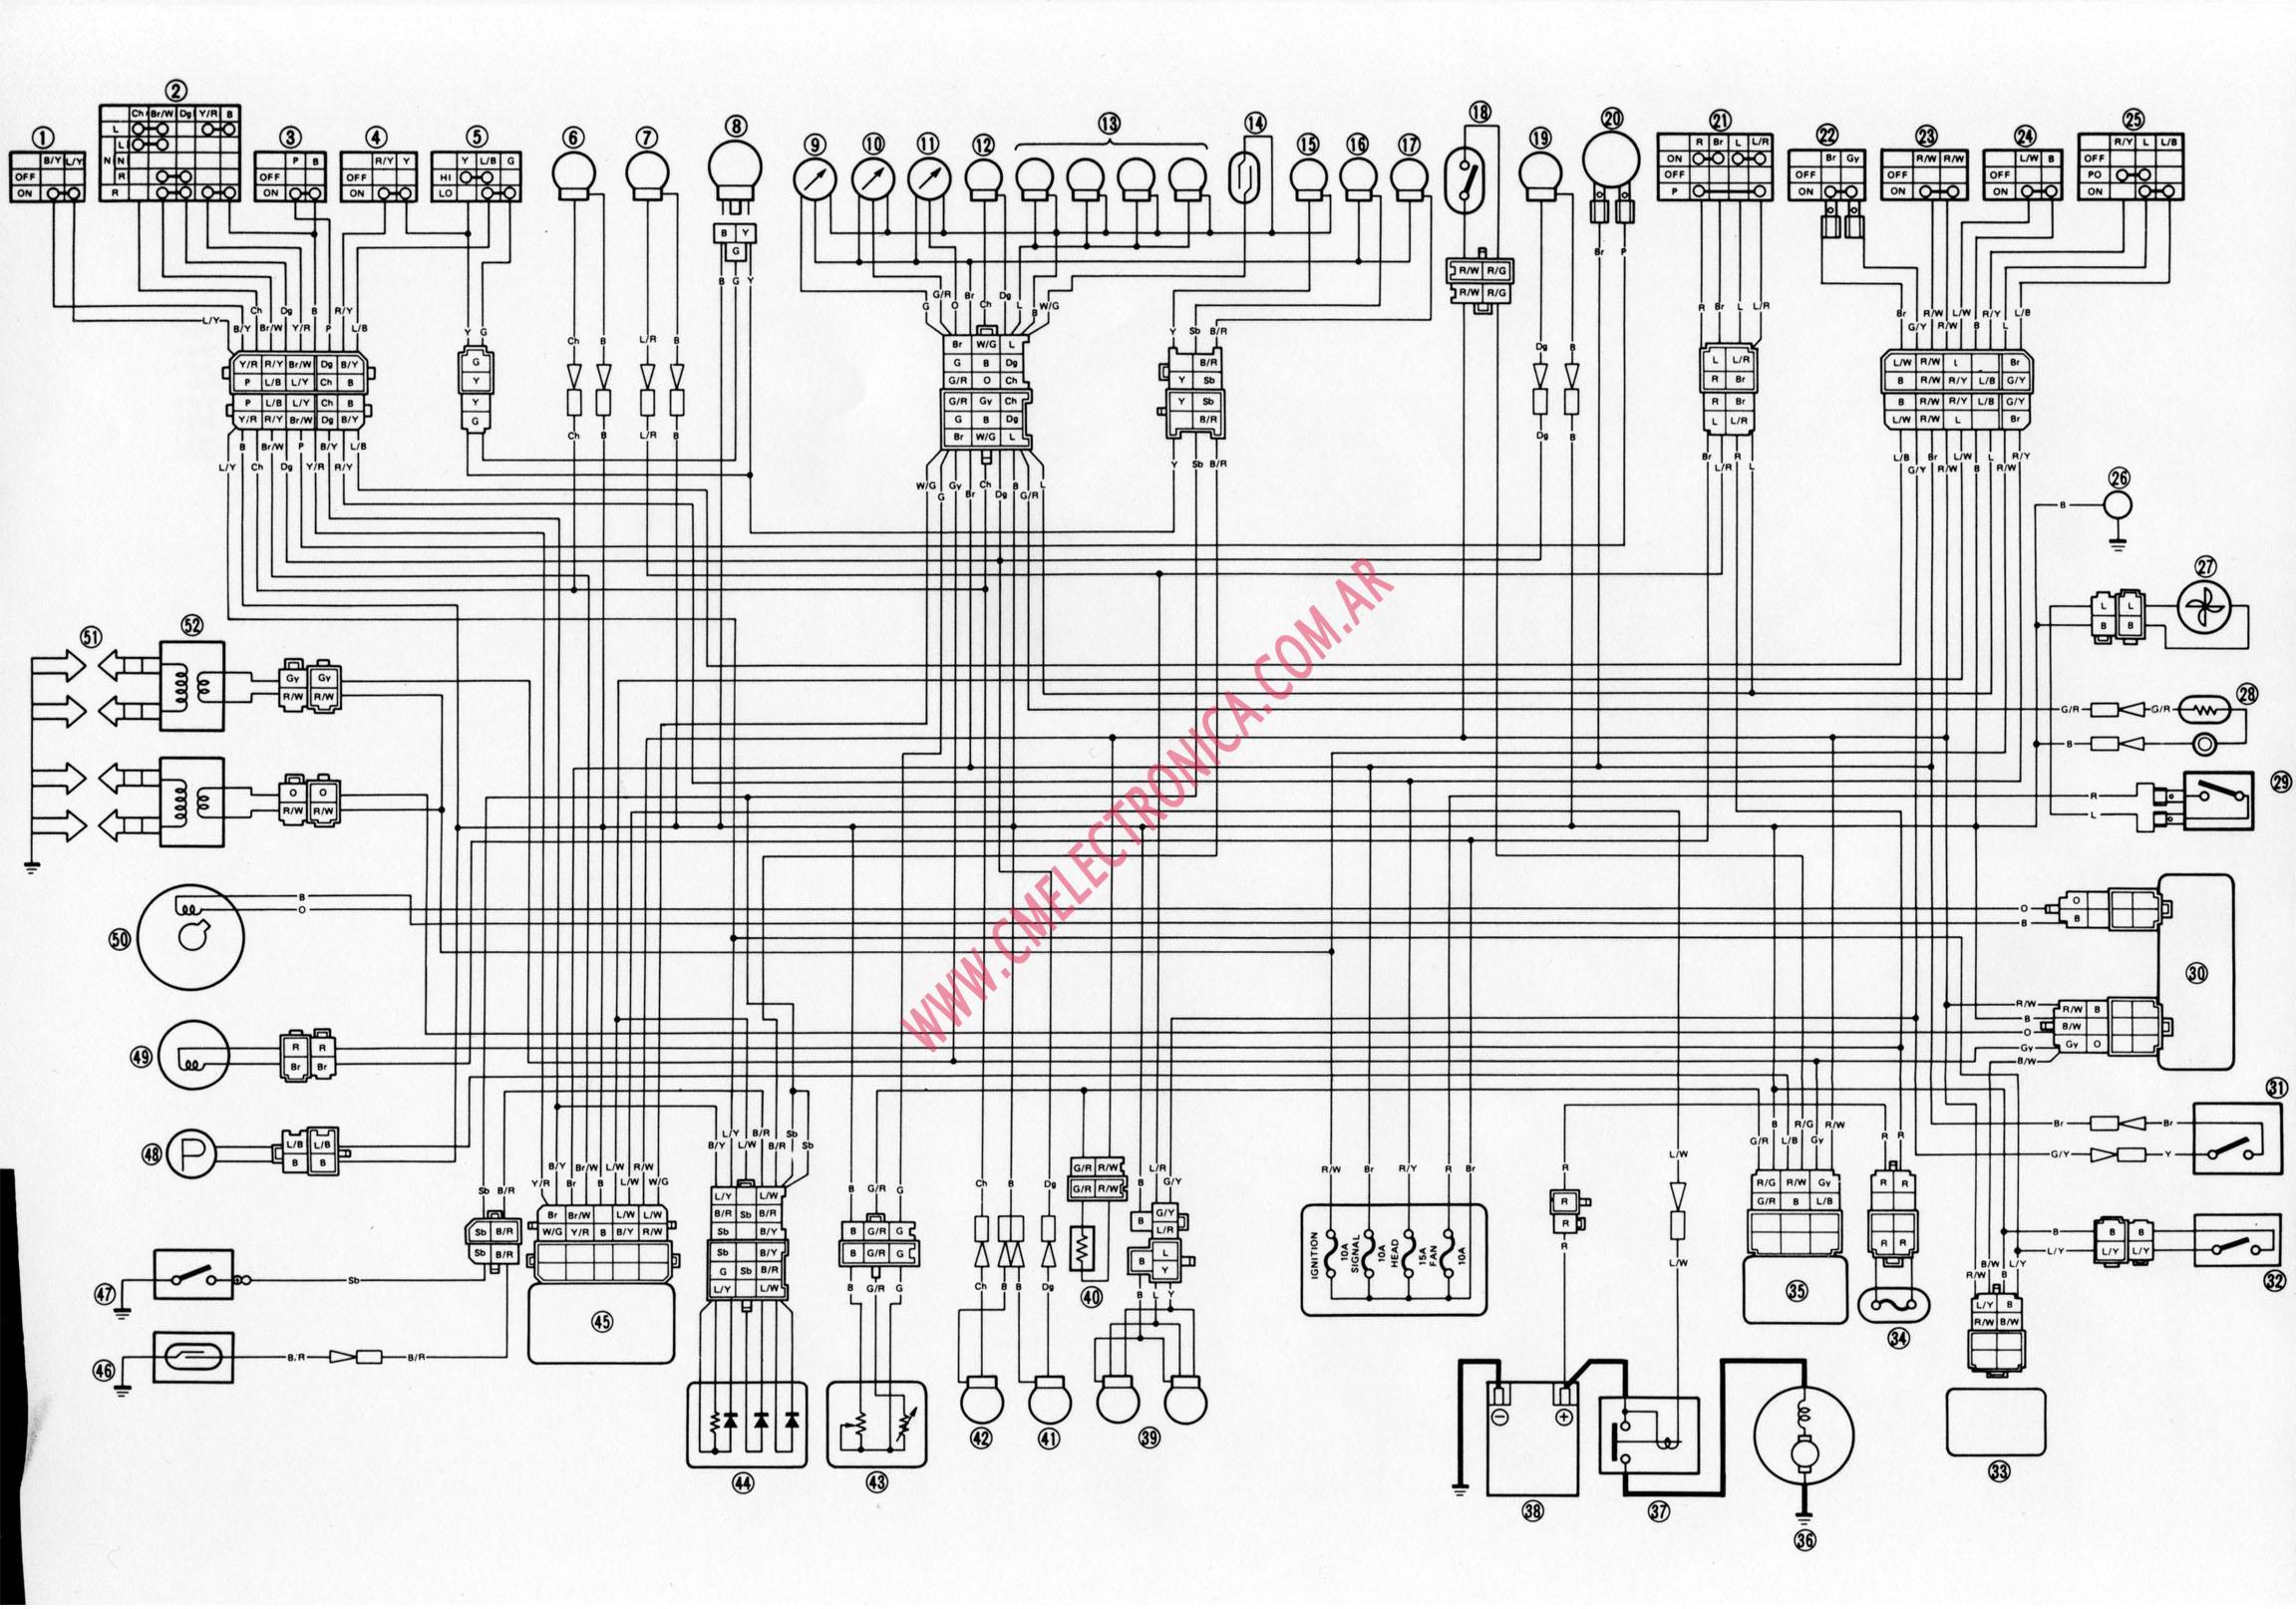 fzr wiring diagram wiring diagram databasefzr 1000 wiring diagram diagram data schema fzr ignition wiring diagram 1994 fzr 1000 wiring diagram